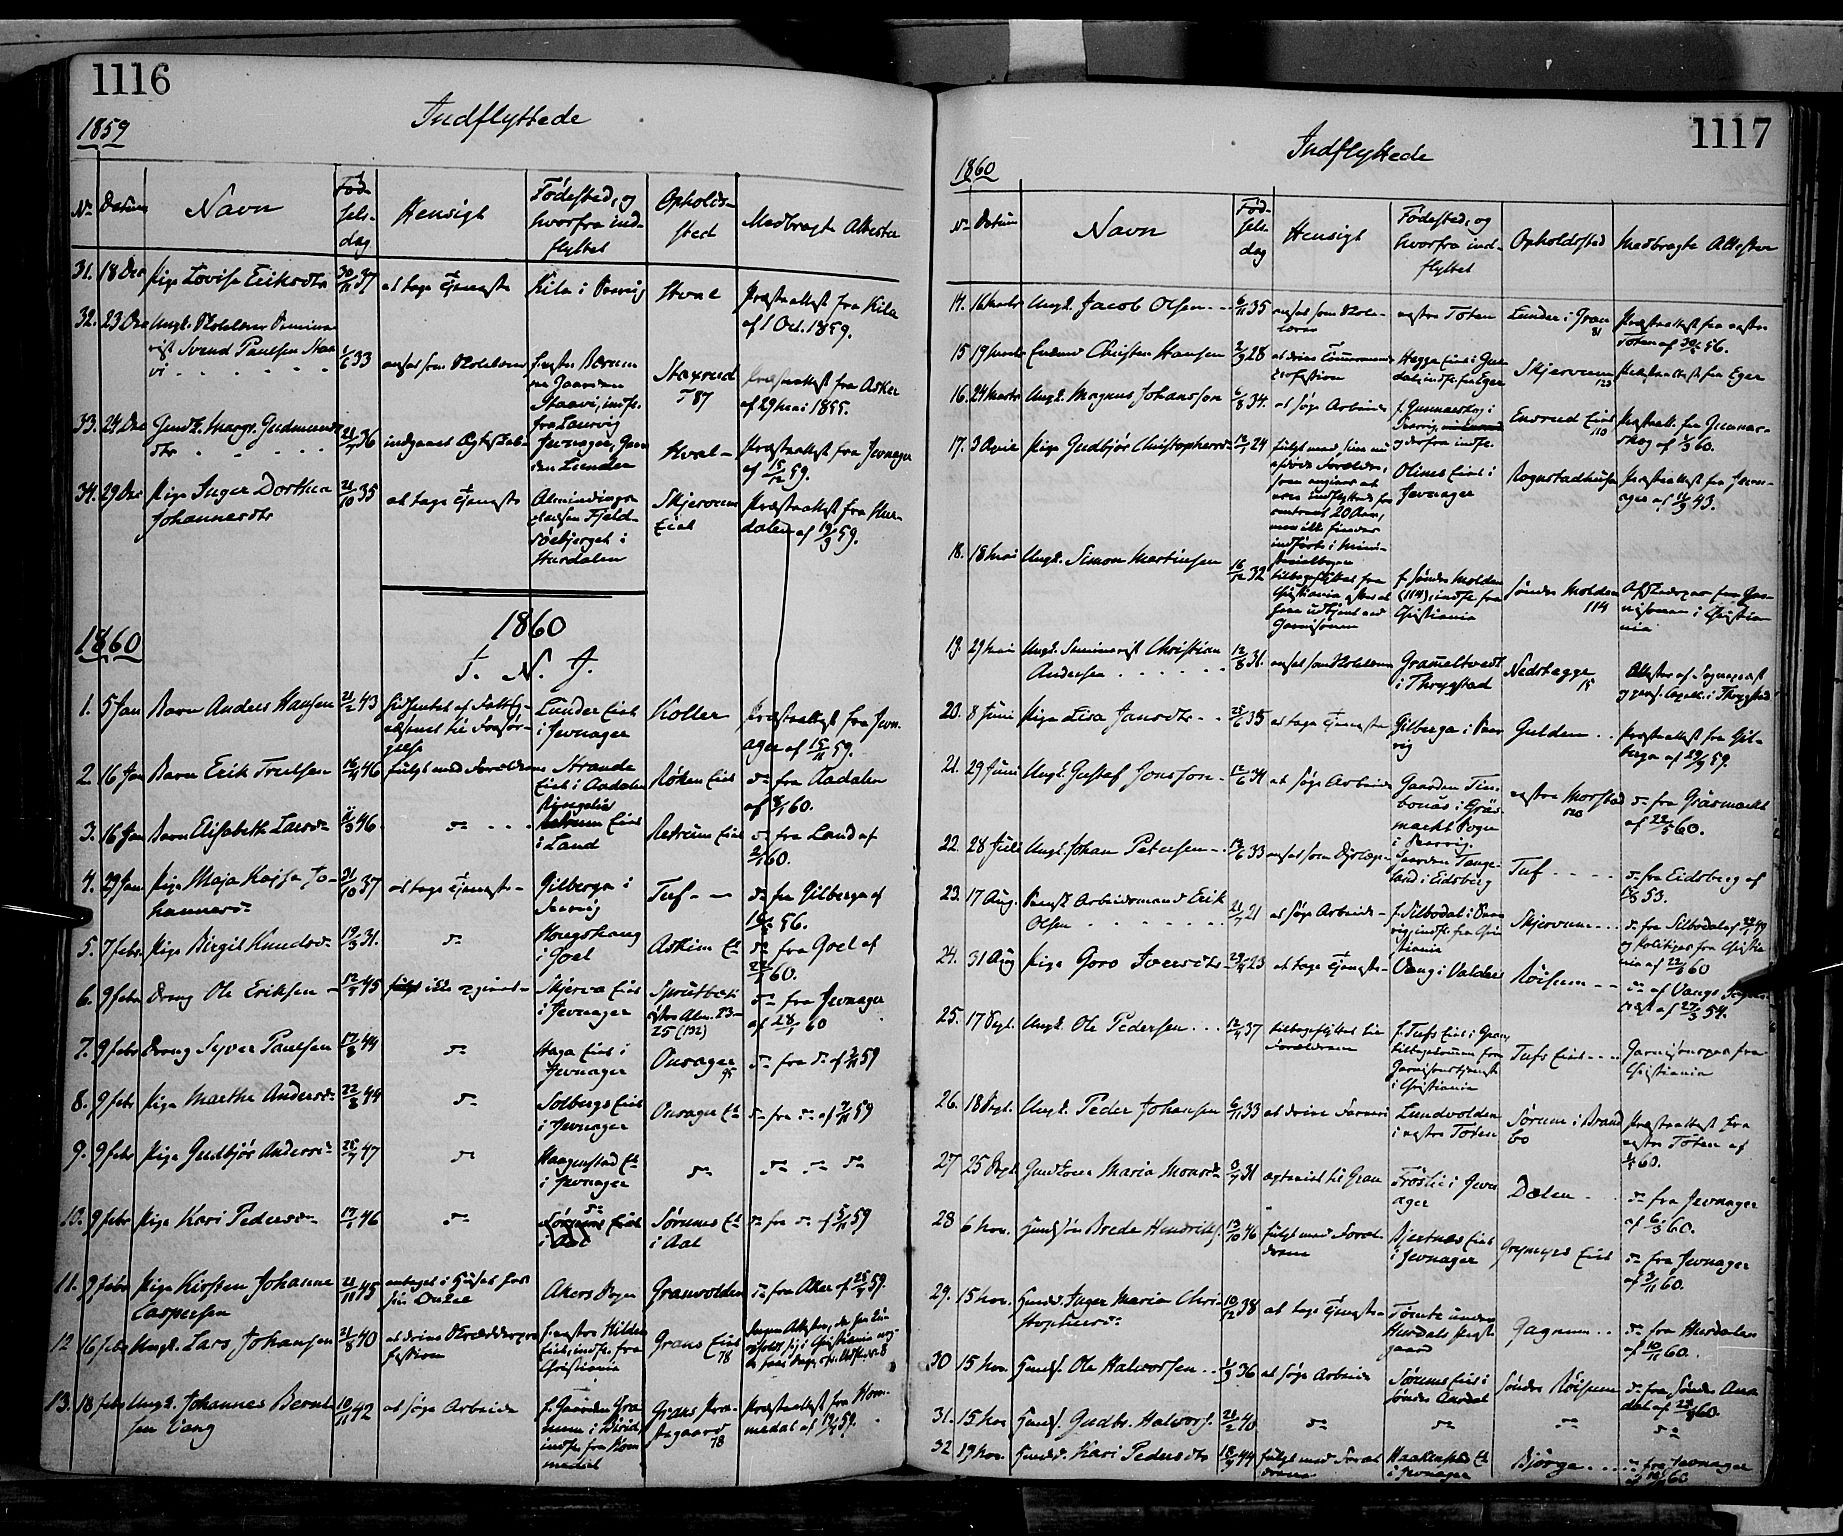 SAH, Gran prestekontor, Ministerialbok nr. 12, 1856-1874, s. 1116-1117